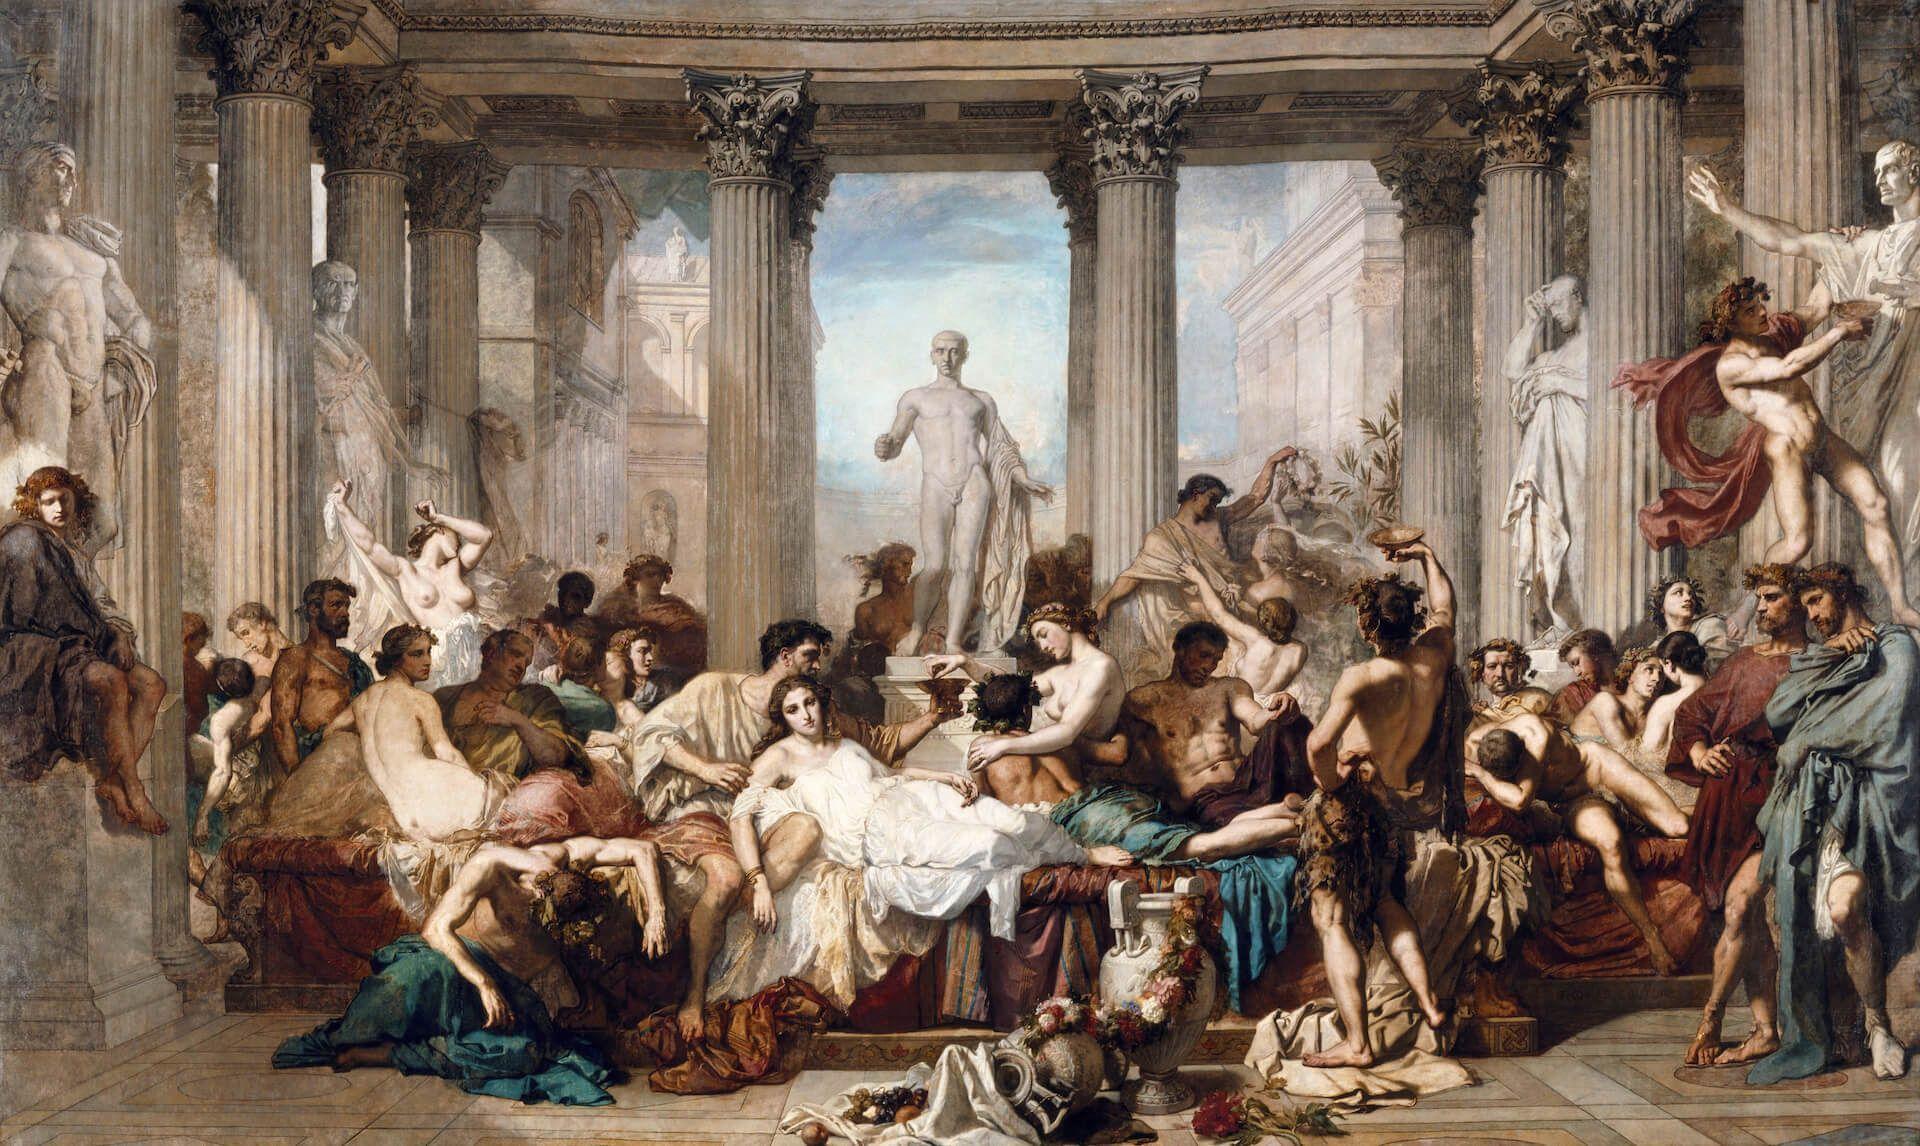 Romanos en la decadencia couture sexo en roma